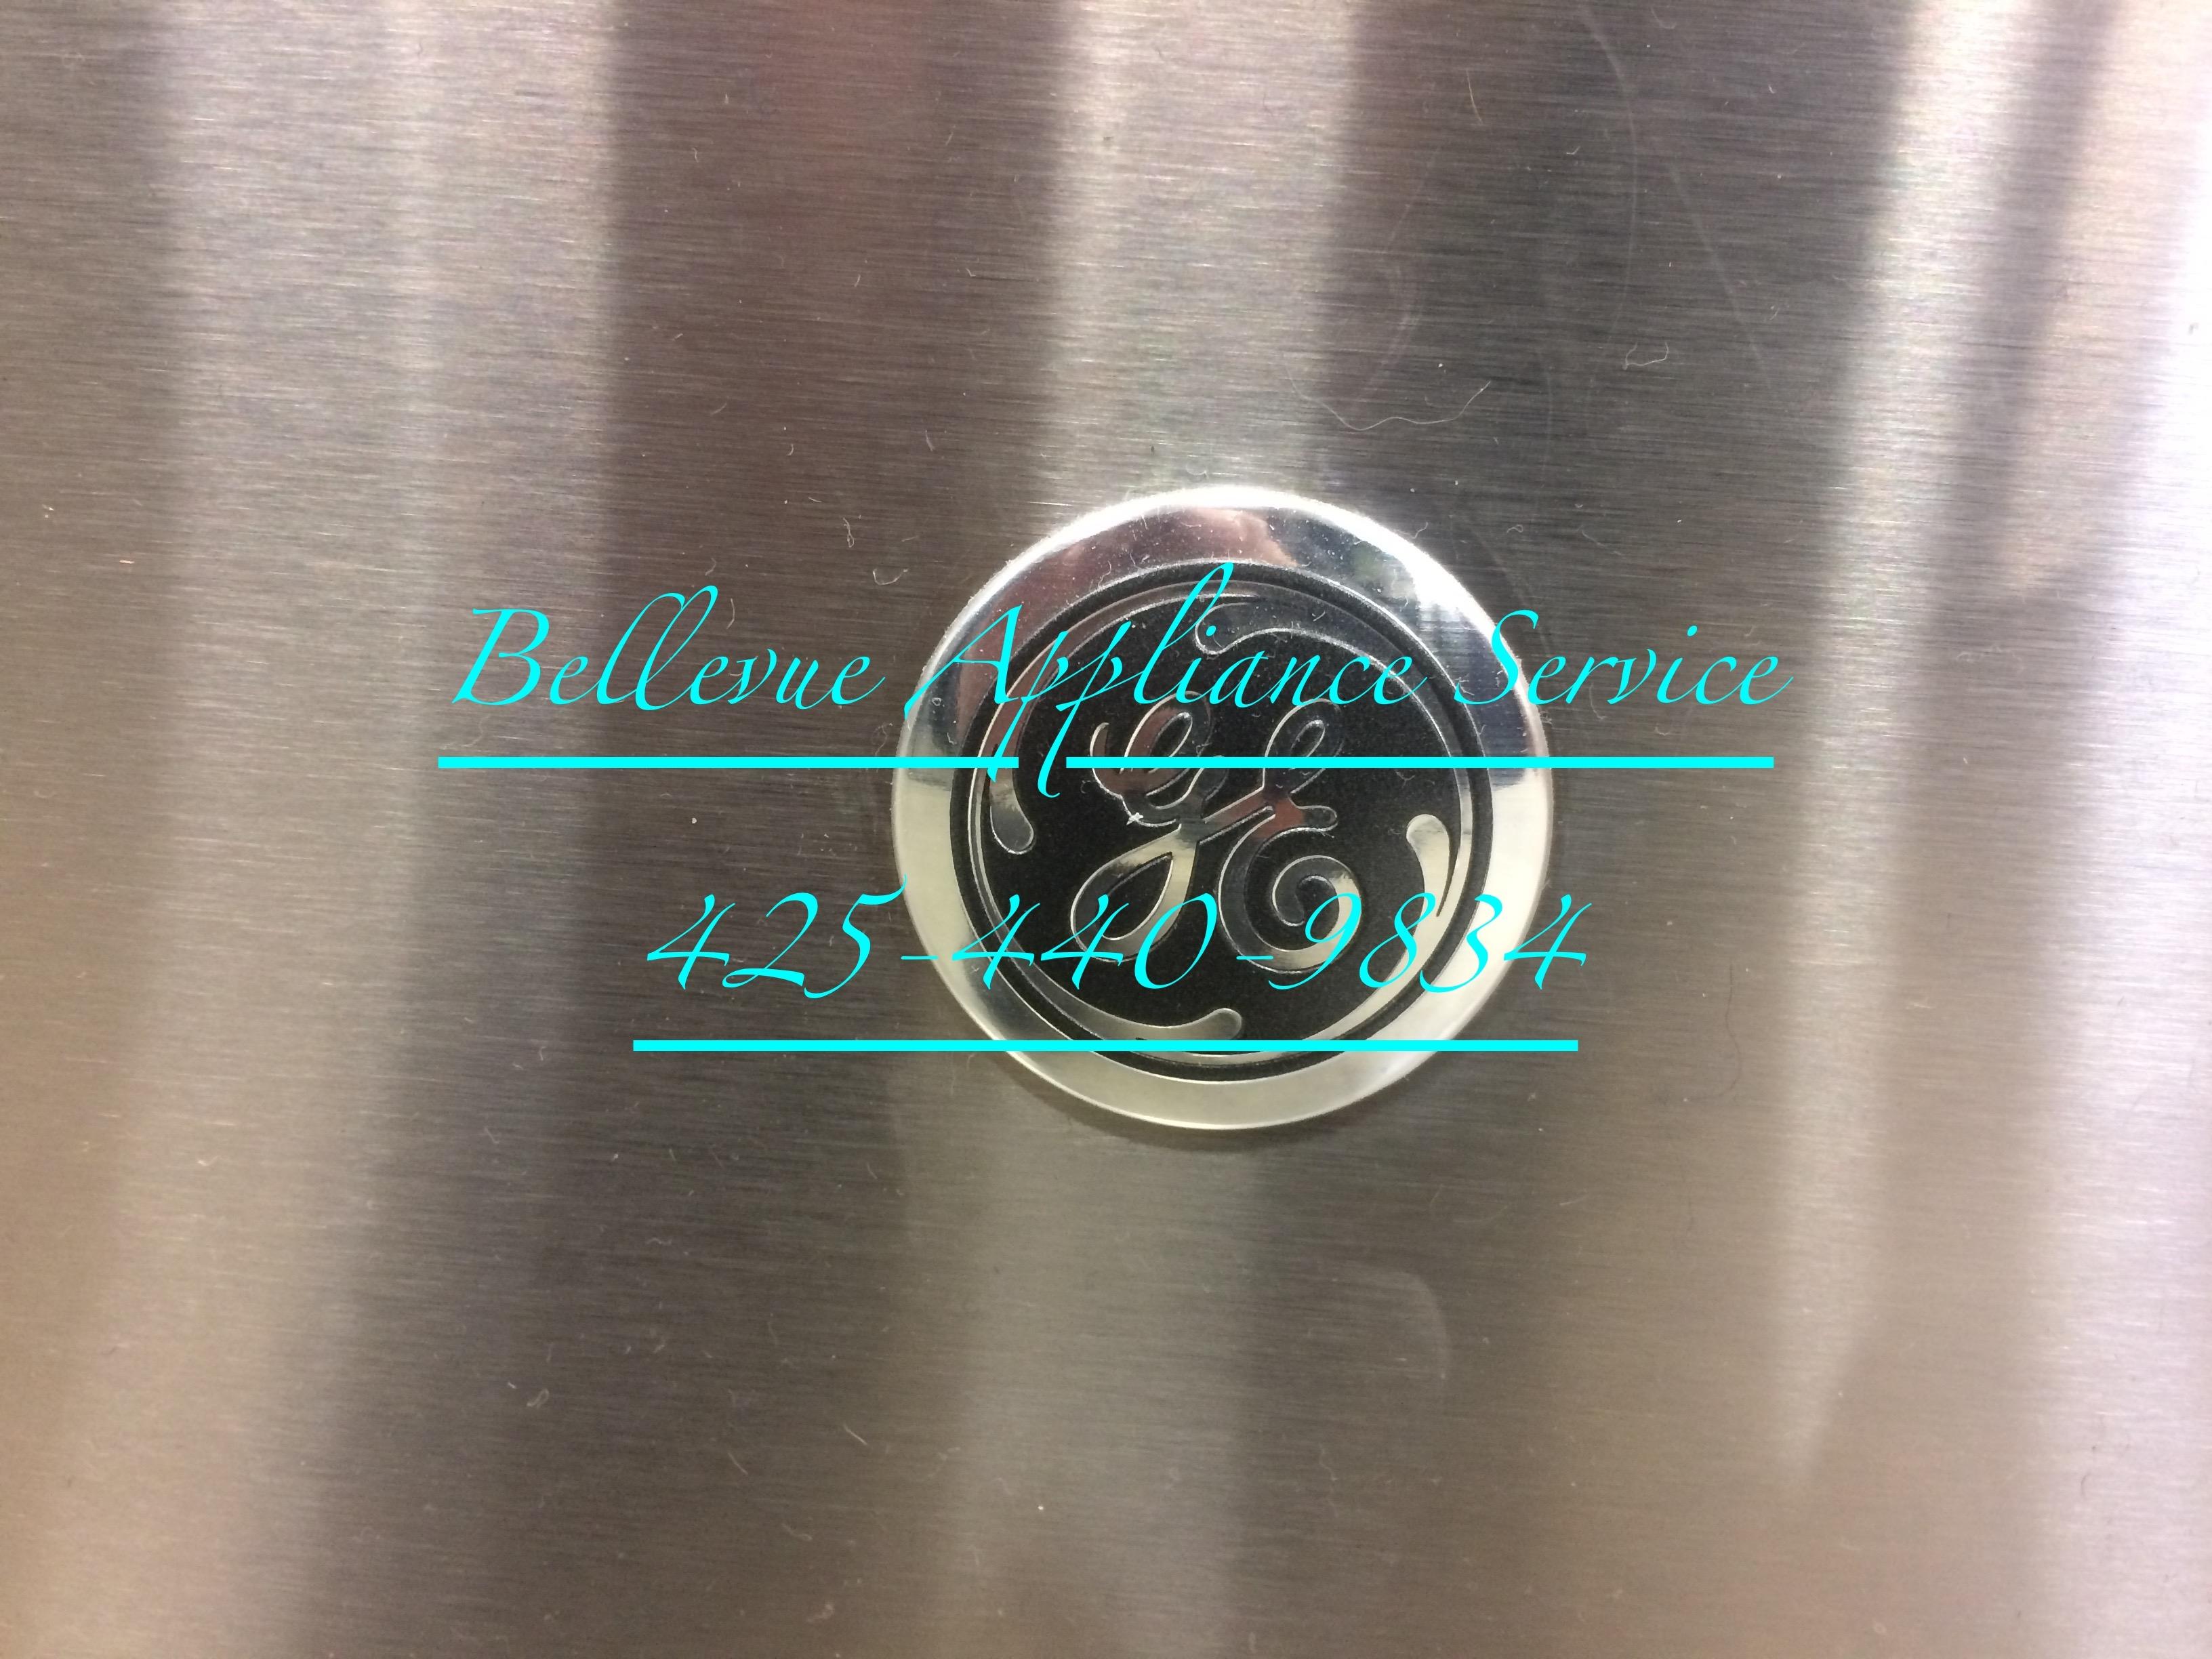 Bellevue Appliance Service image 11